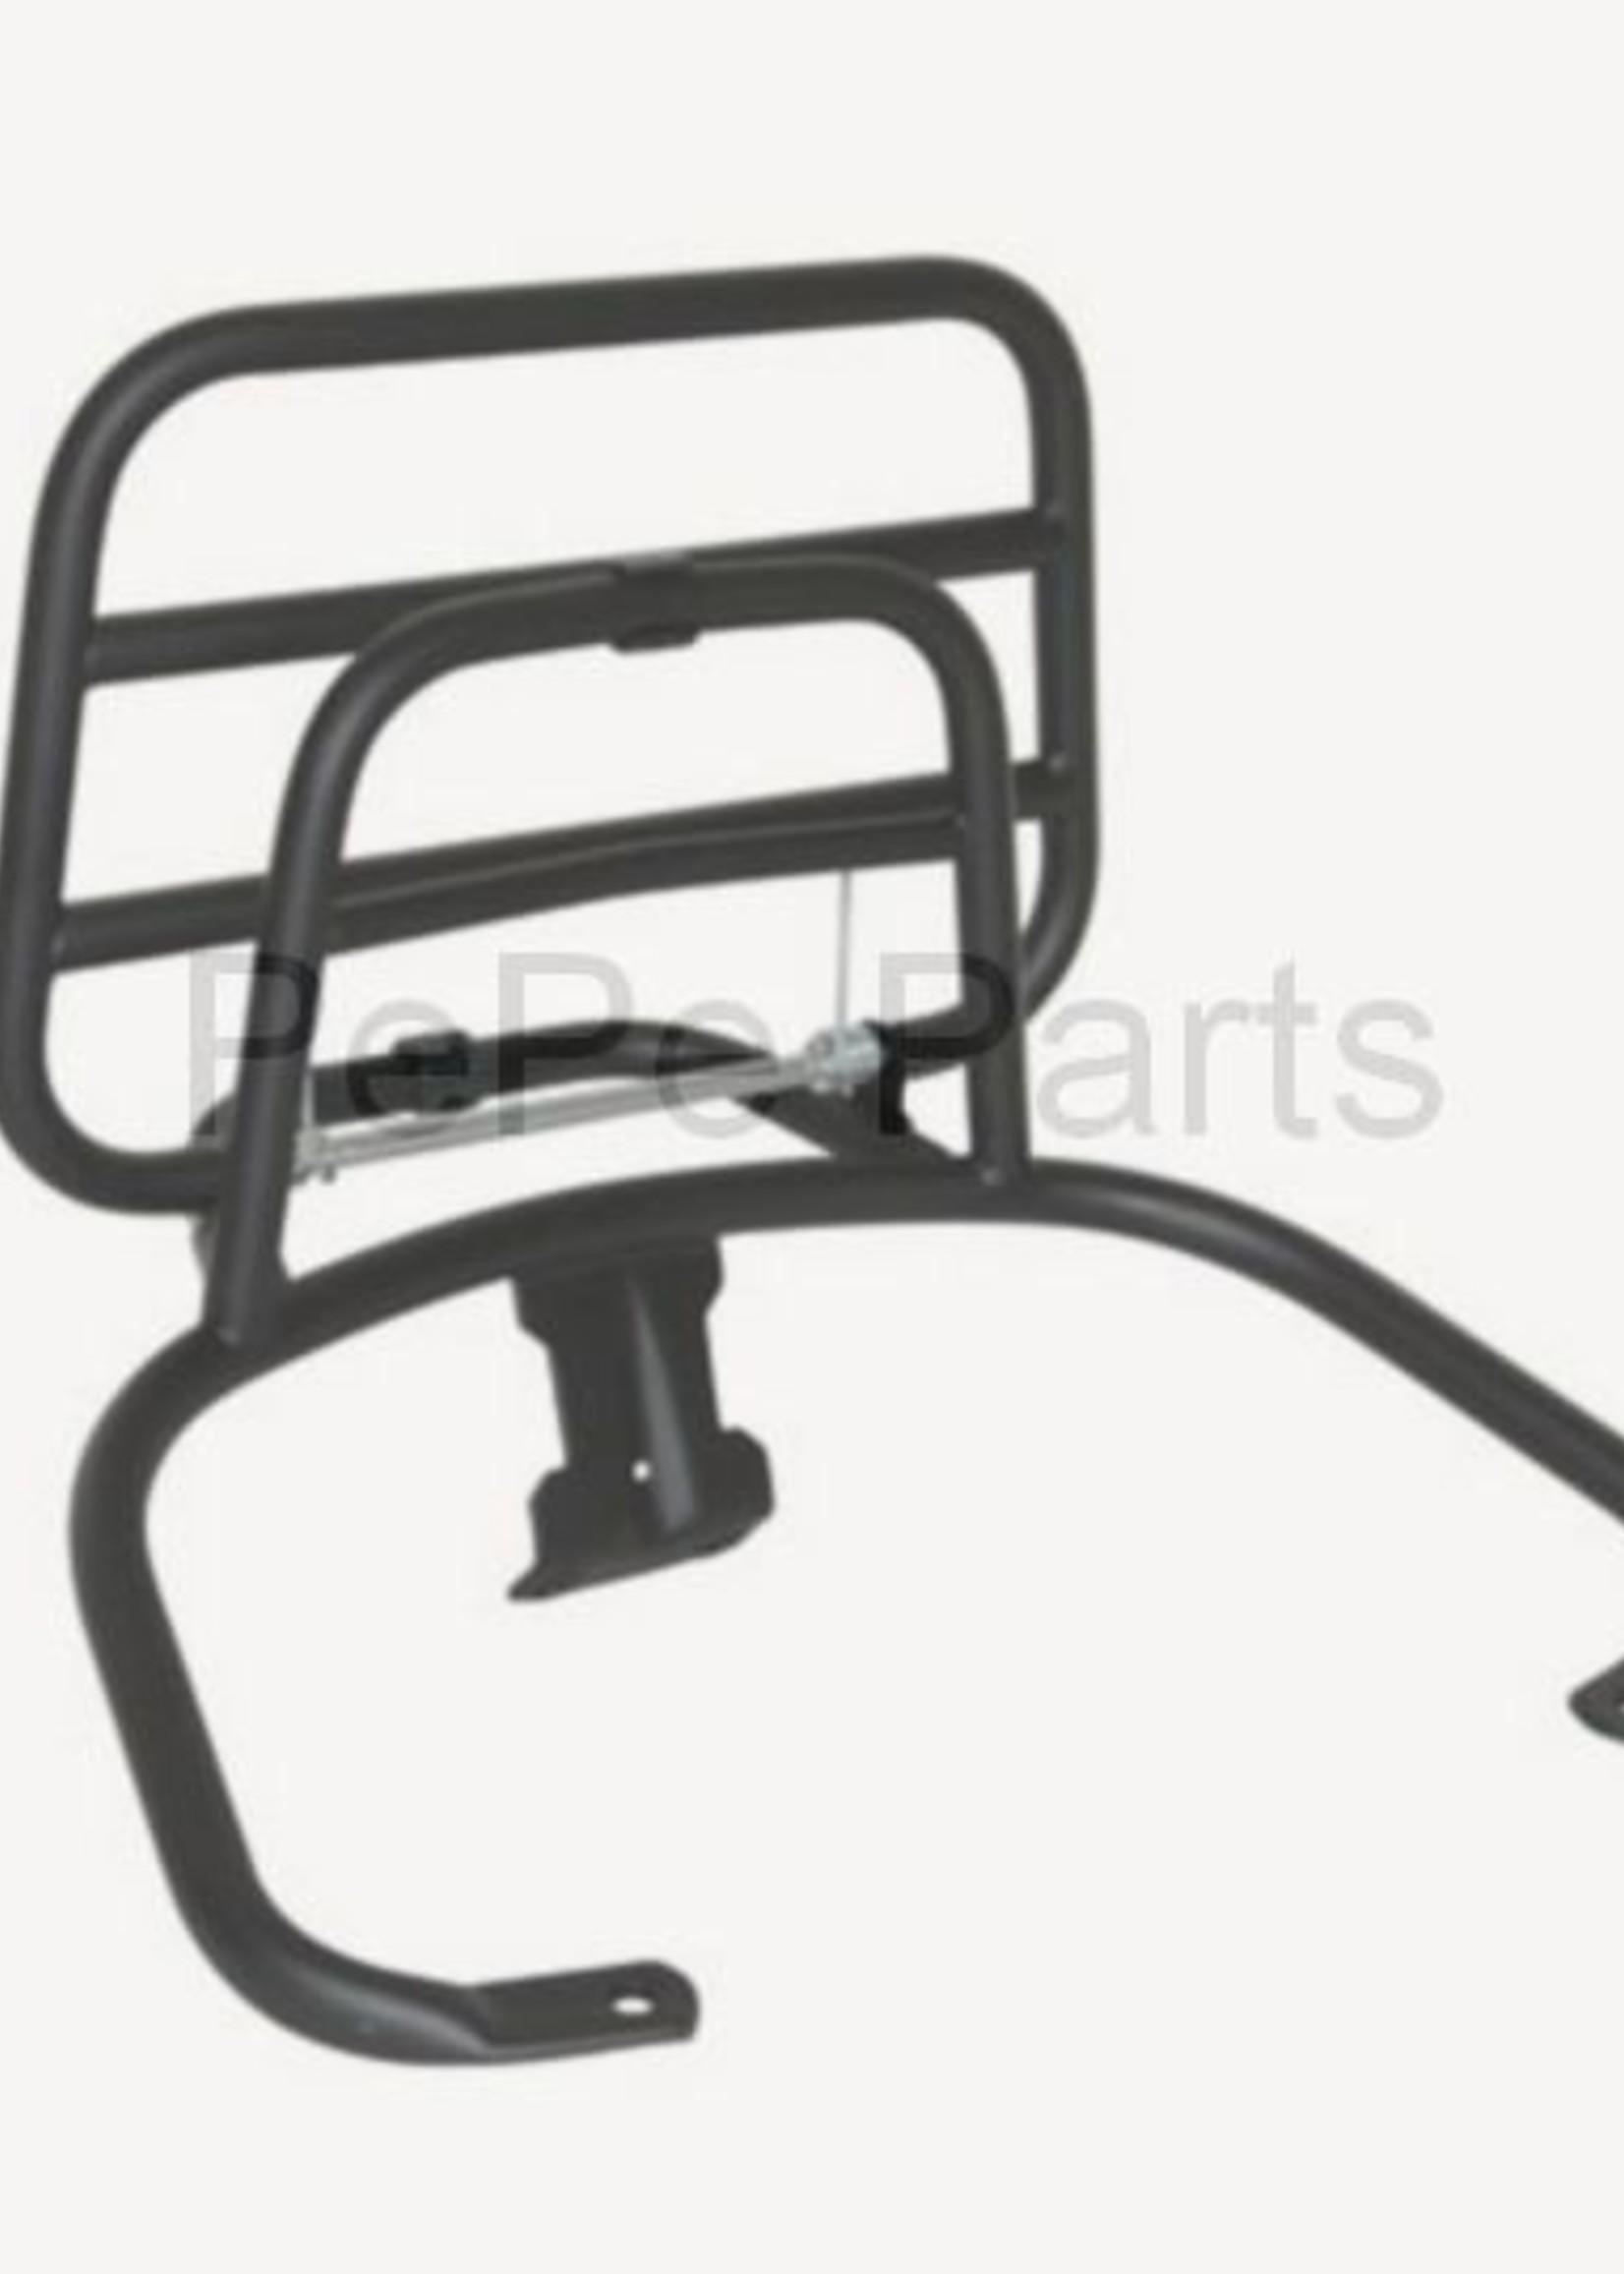 Achterdrager opklapbaar orig. kwaliteit lxv/ vespa lx/ vespa s zwart